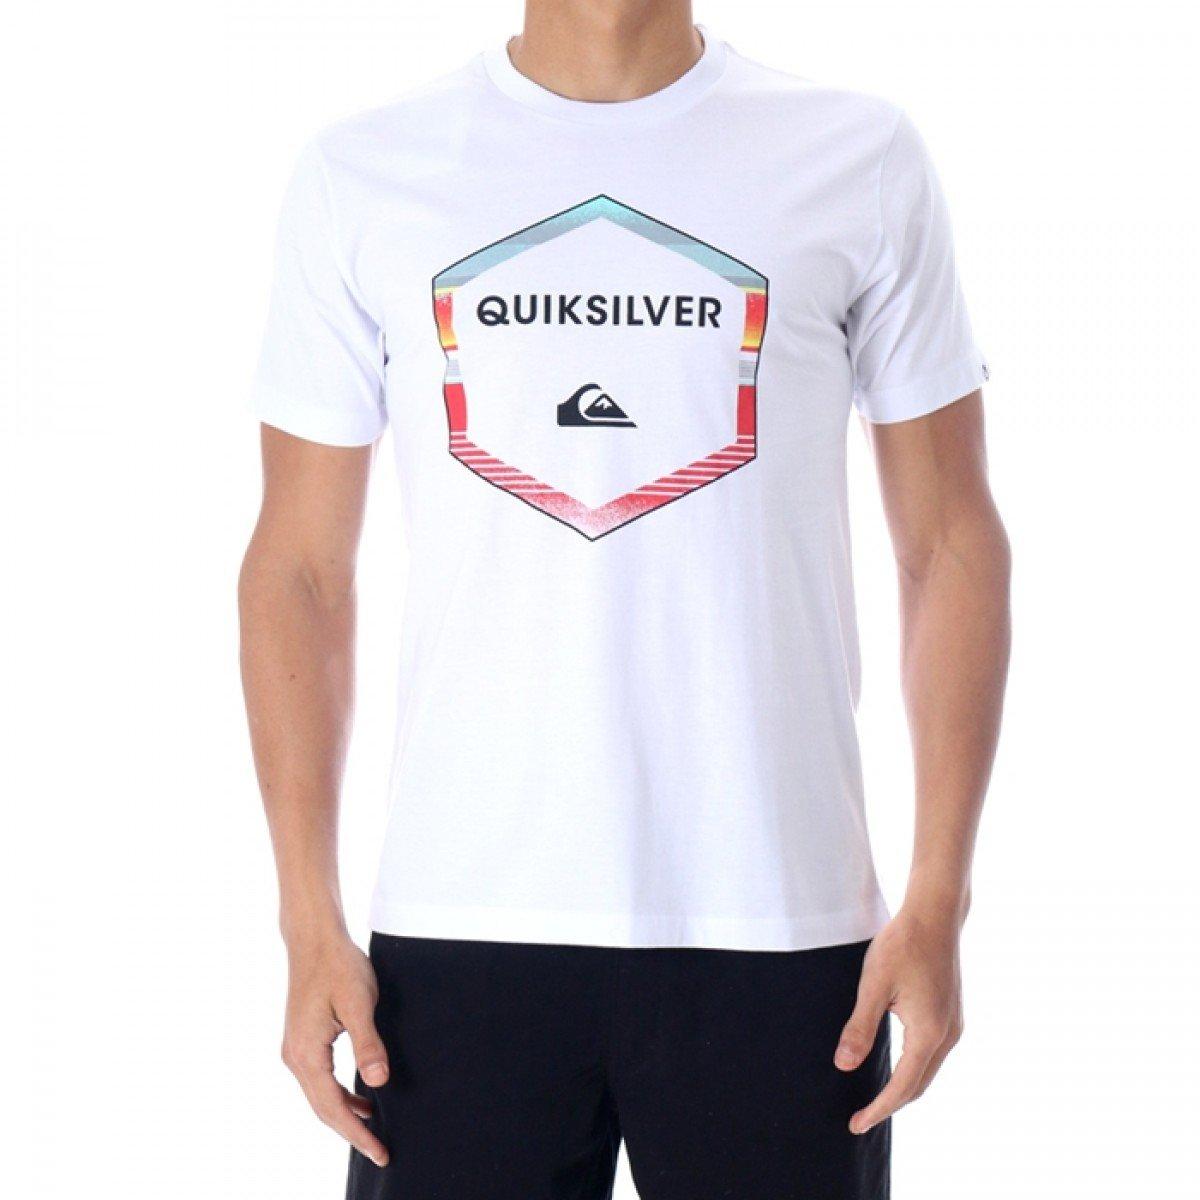 Camiseta Quiksilver Geometric Masculina - Branca